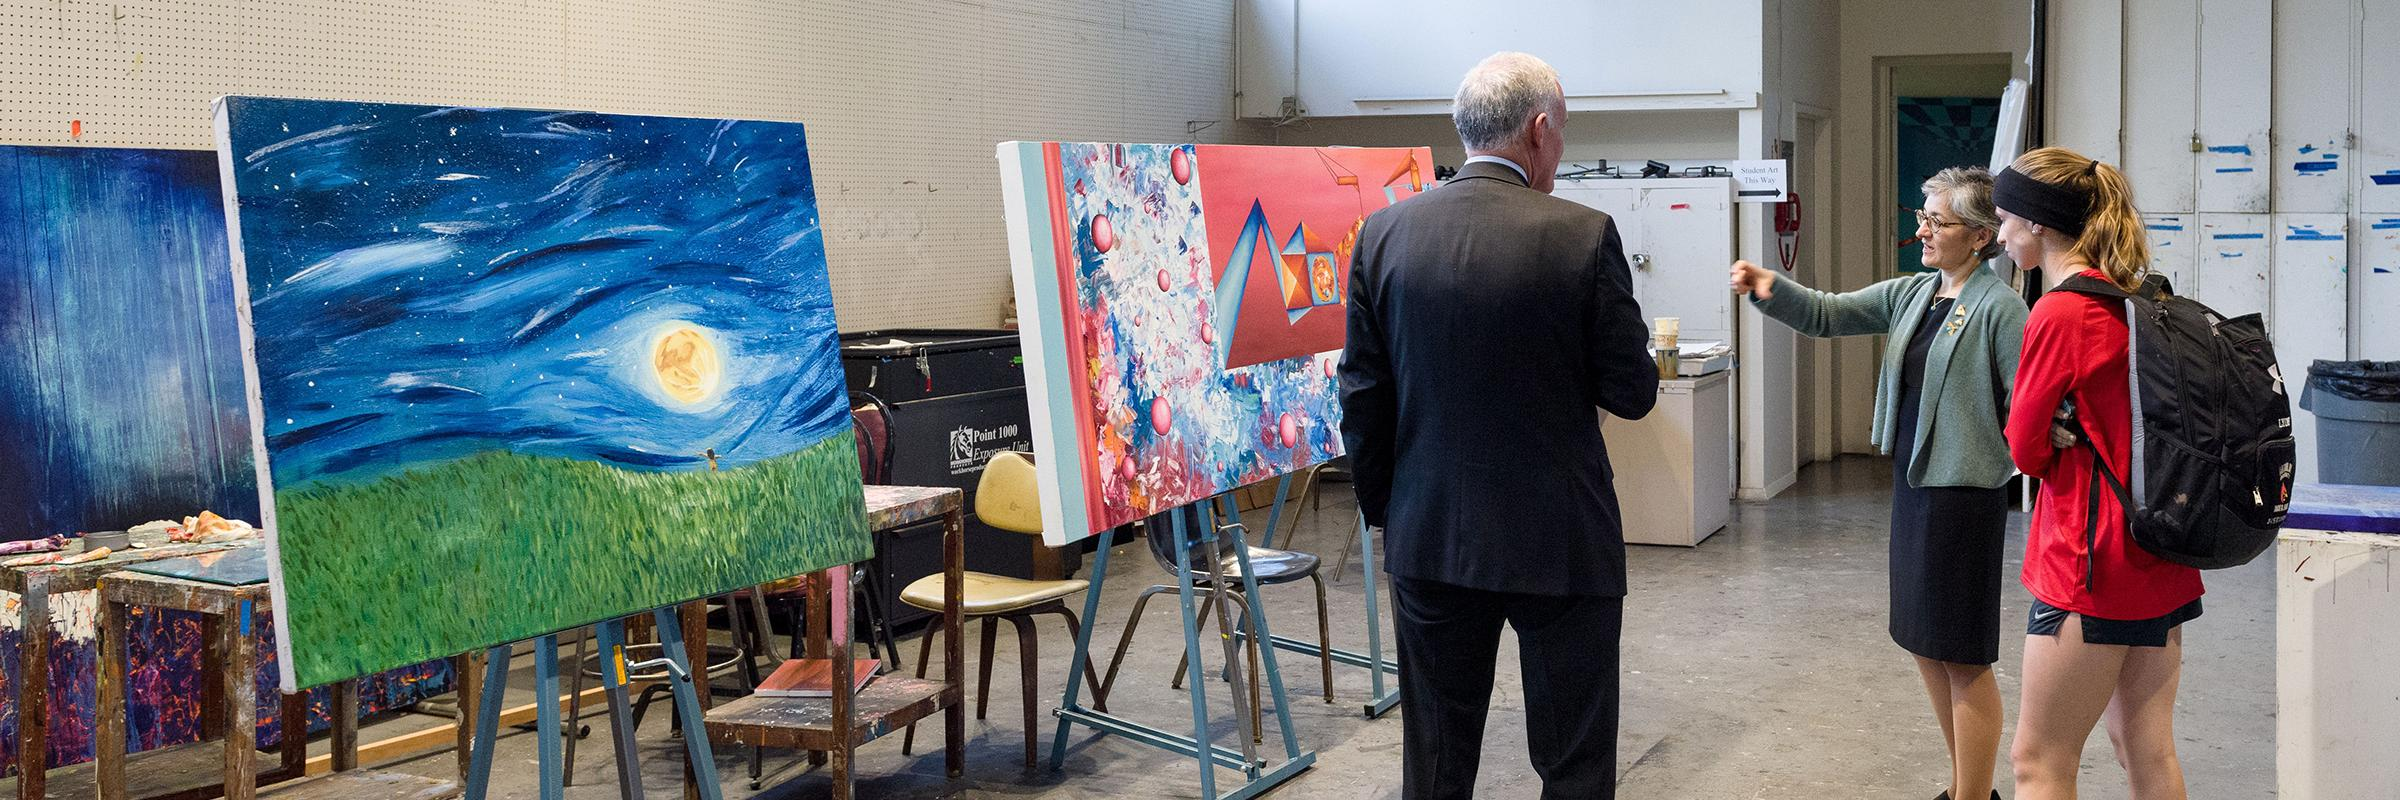 Looking at student art in Salve Regina Gallery